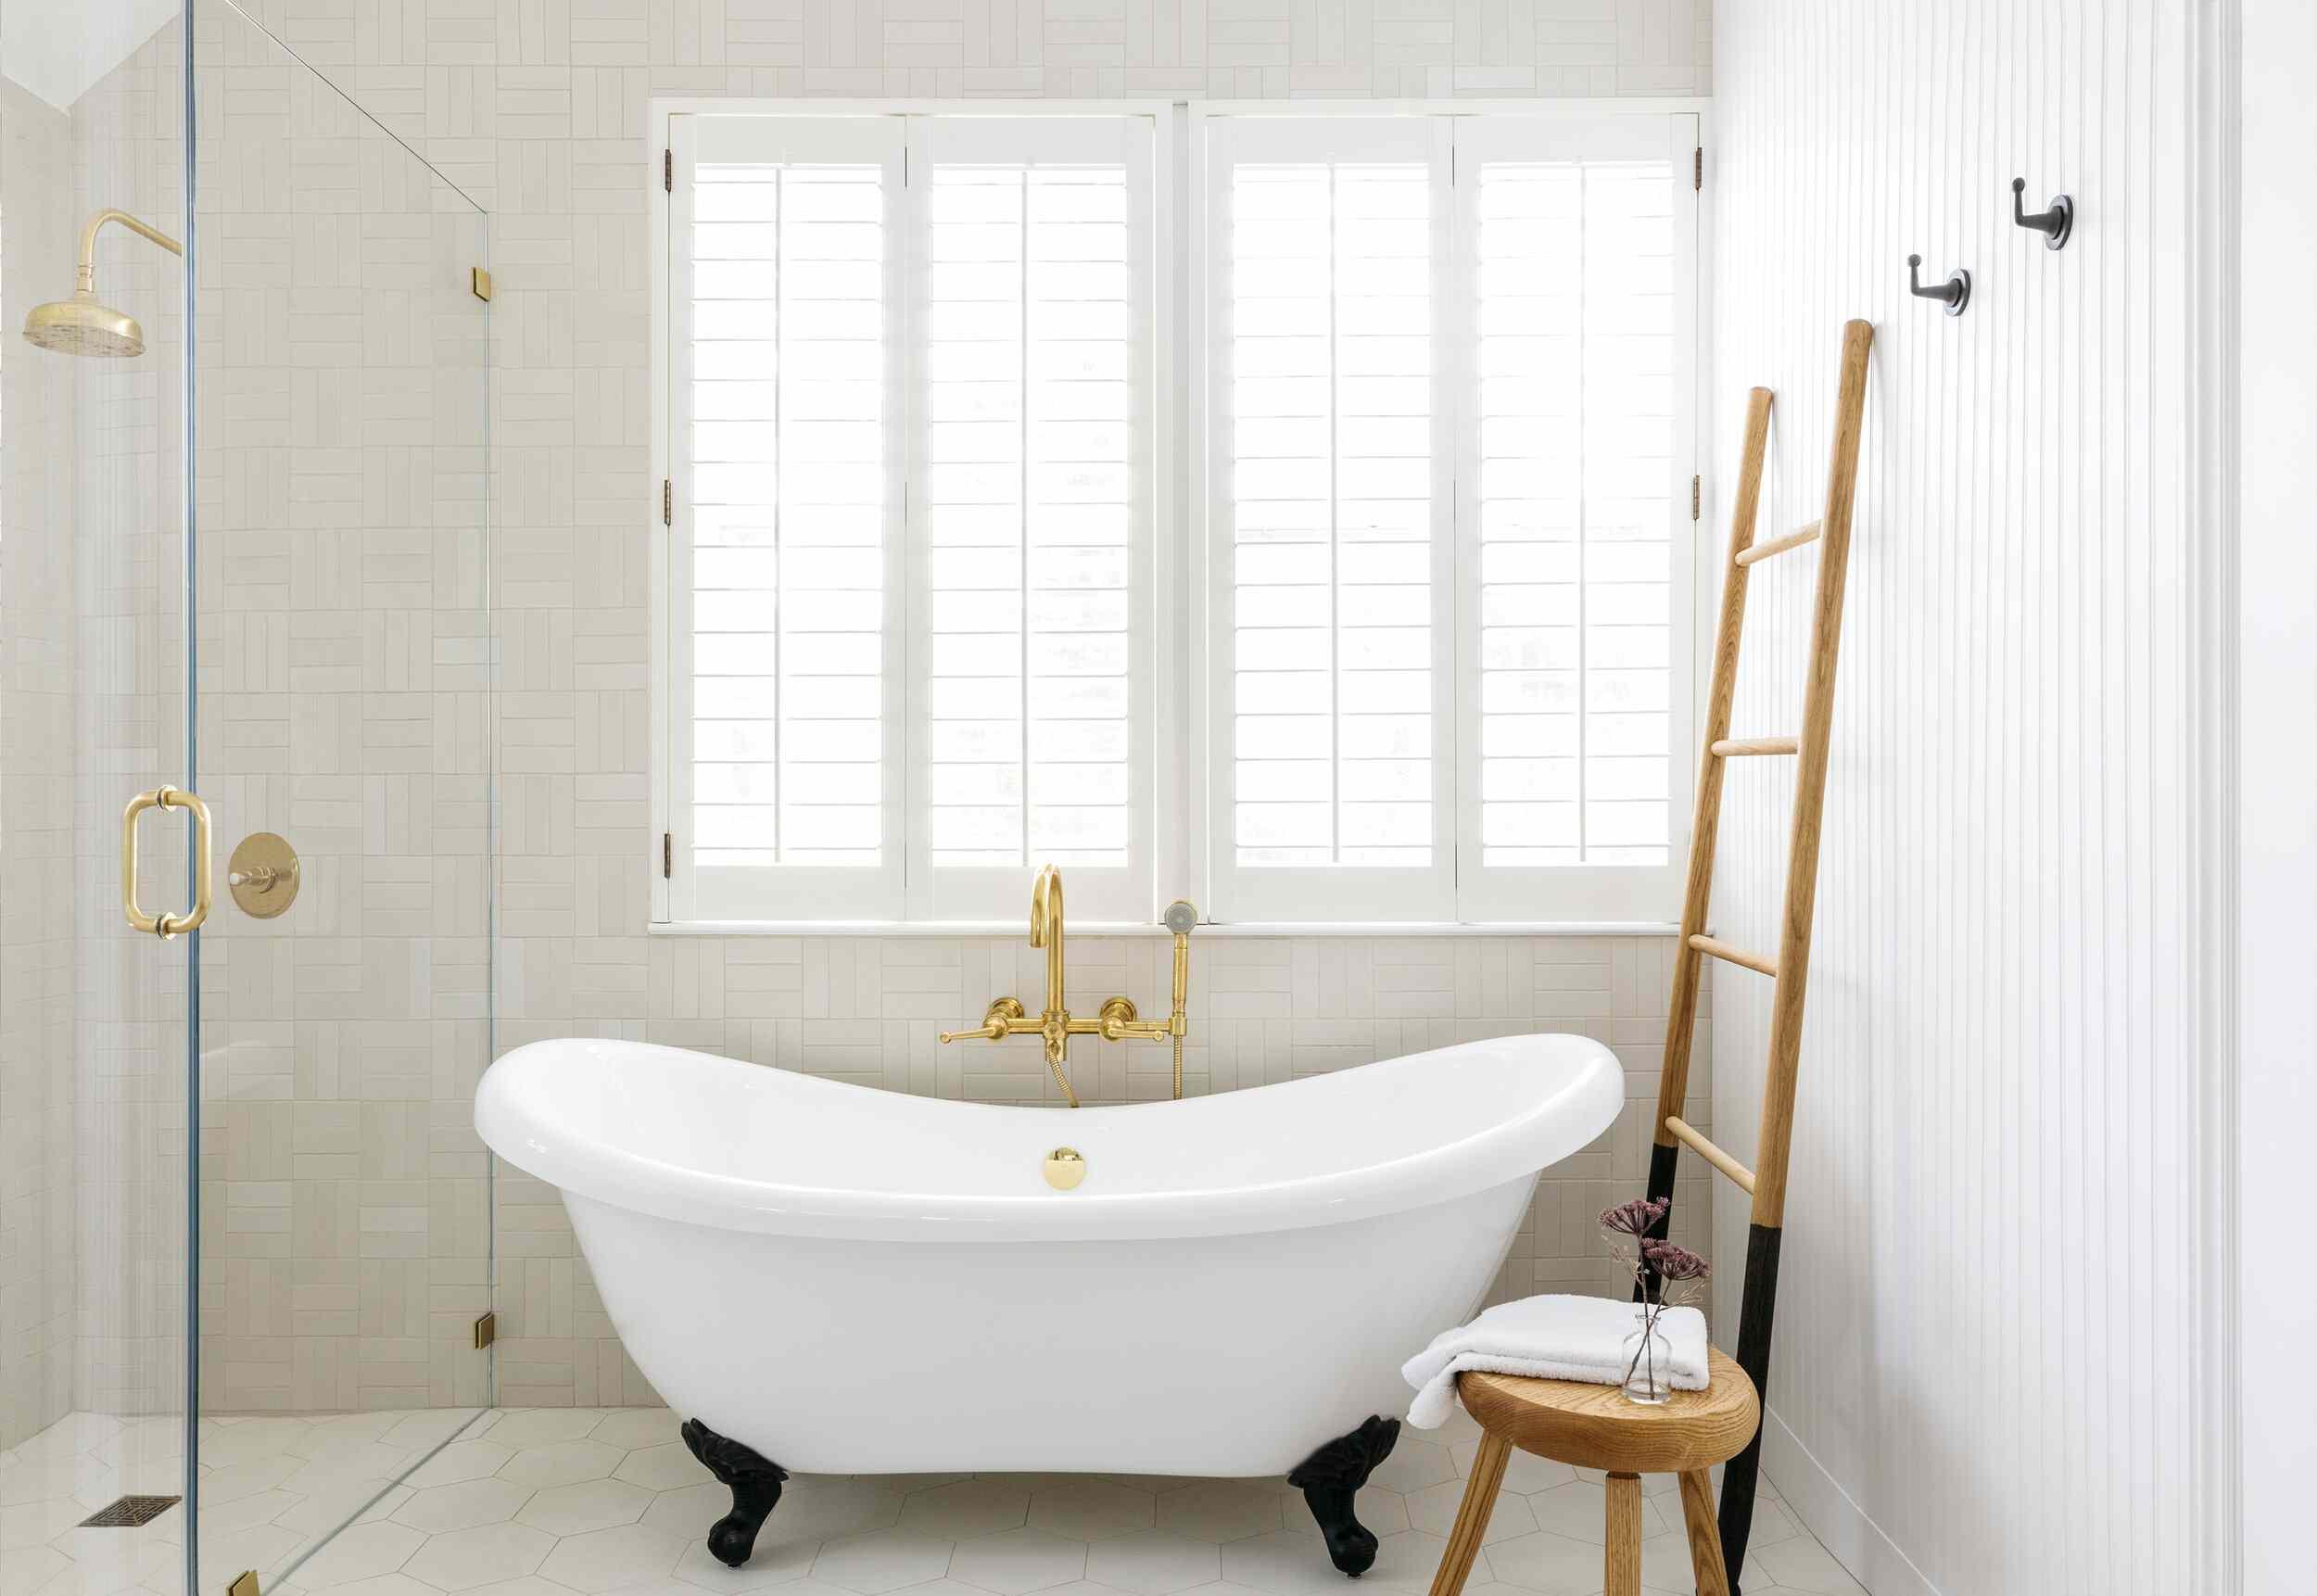 Bathroom with wall paneling